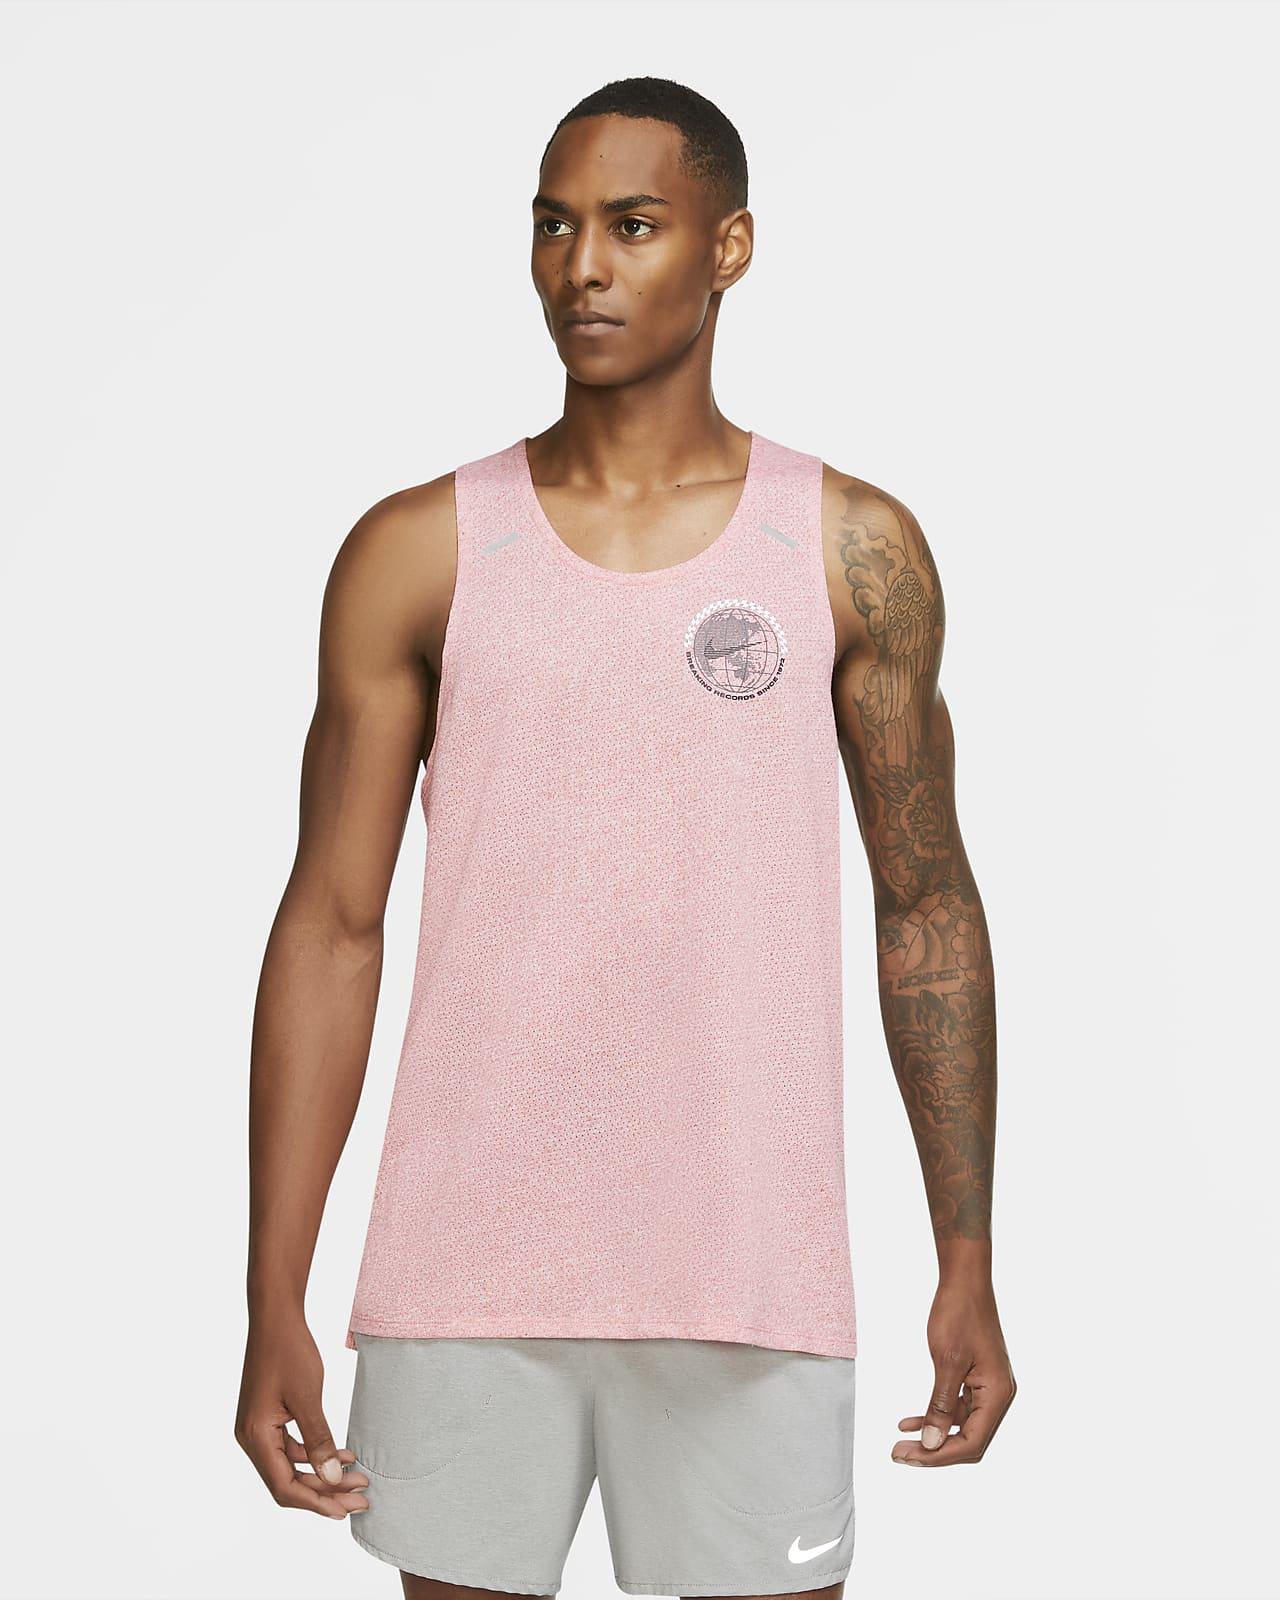 Camiseta de tirantes de running para hombre Nike Rise 365 Future Fast